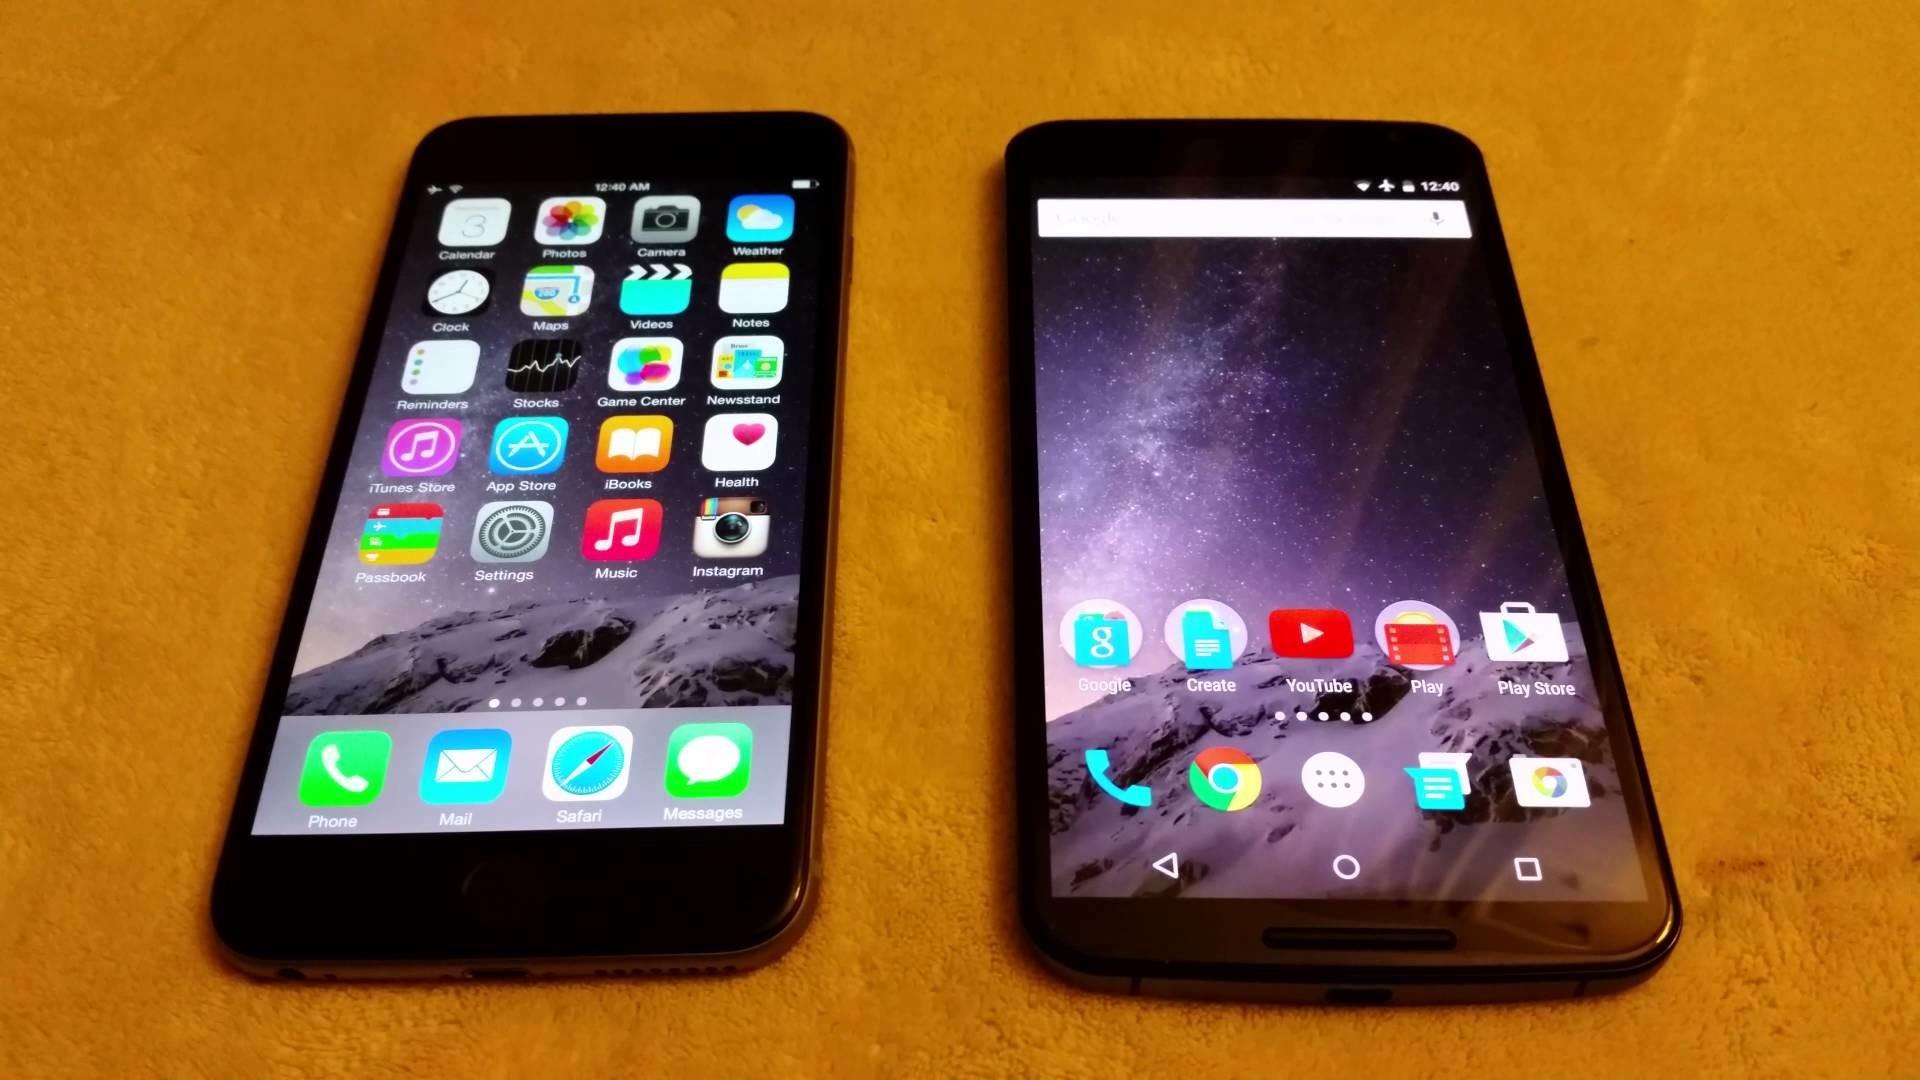 Nexus 6 Vs iPhone 6 plus in 4K